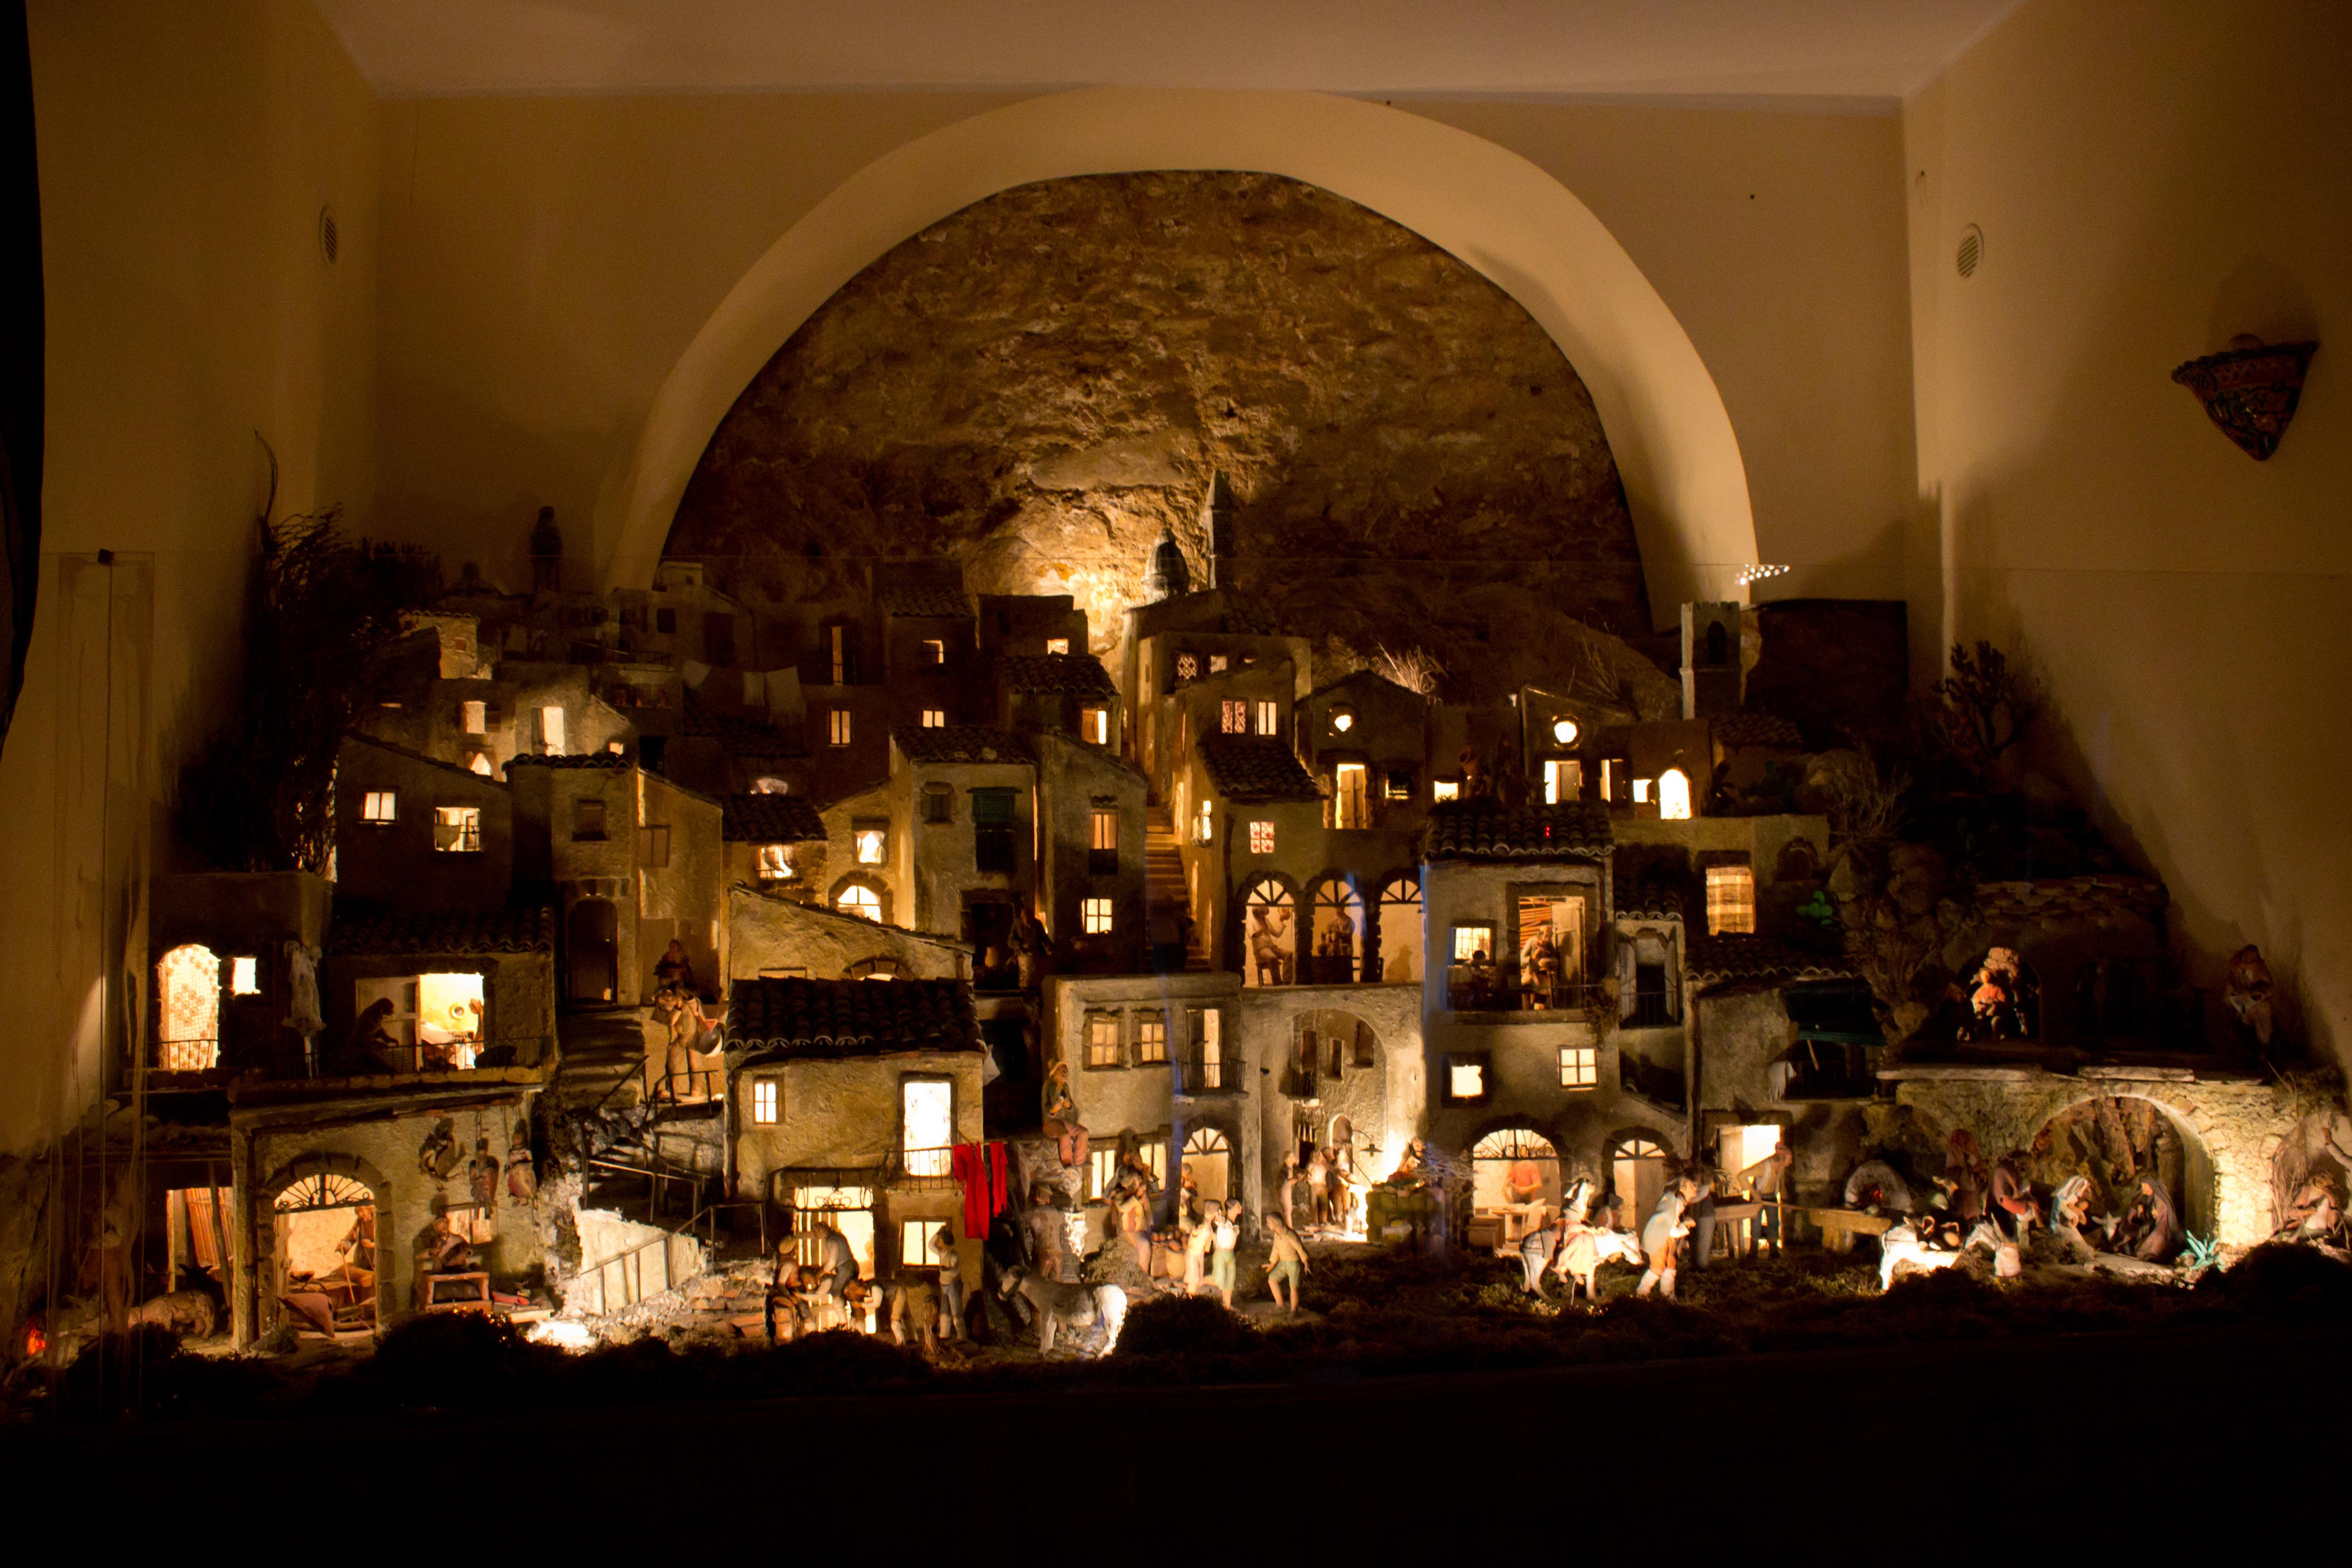 Caltagirone tra ceramica e presepi una citt in grado di incantarti blog sicilian secrets - Presepi fatti in casa ...